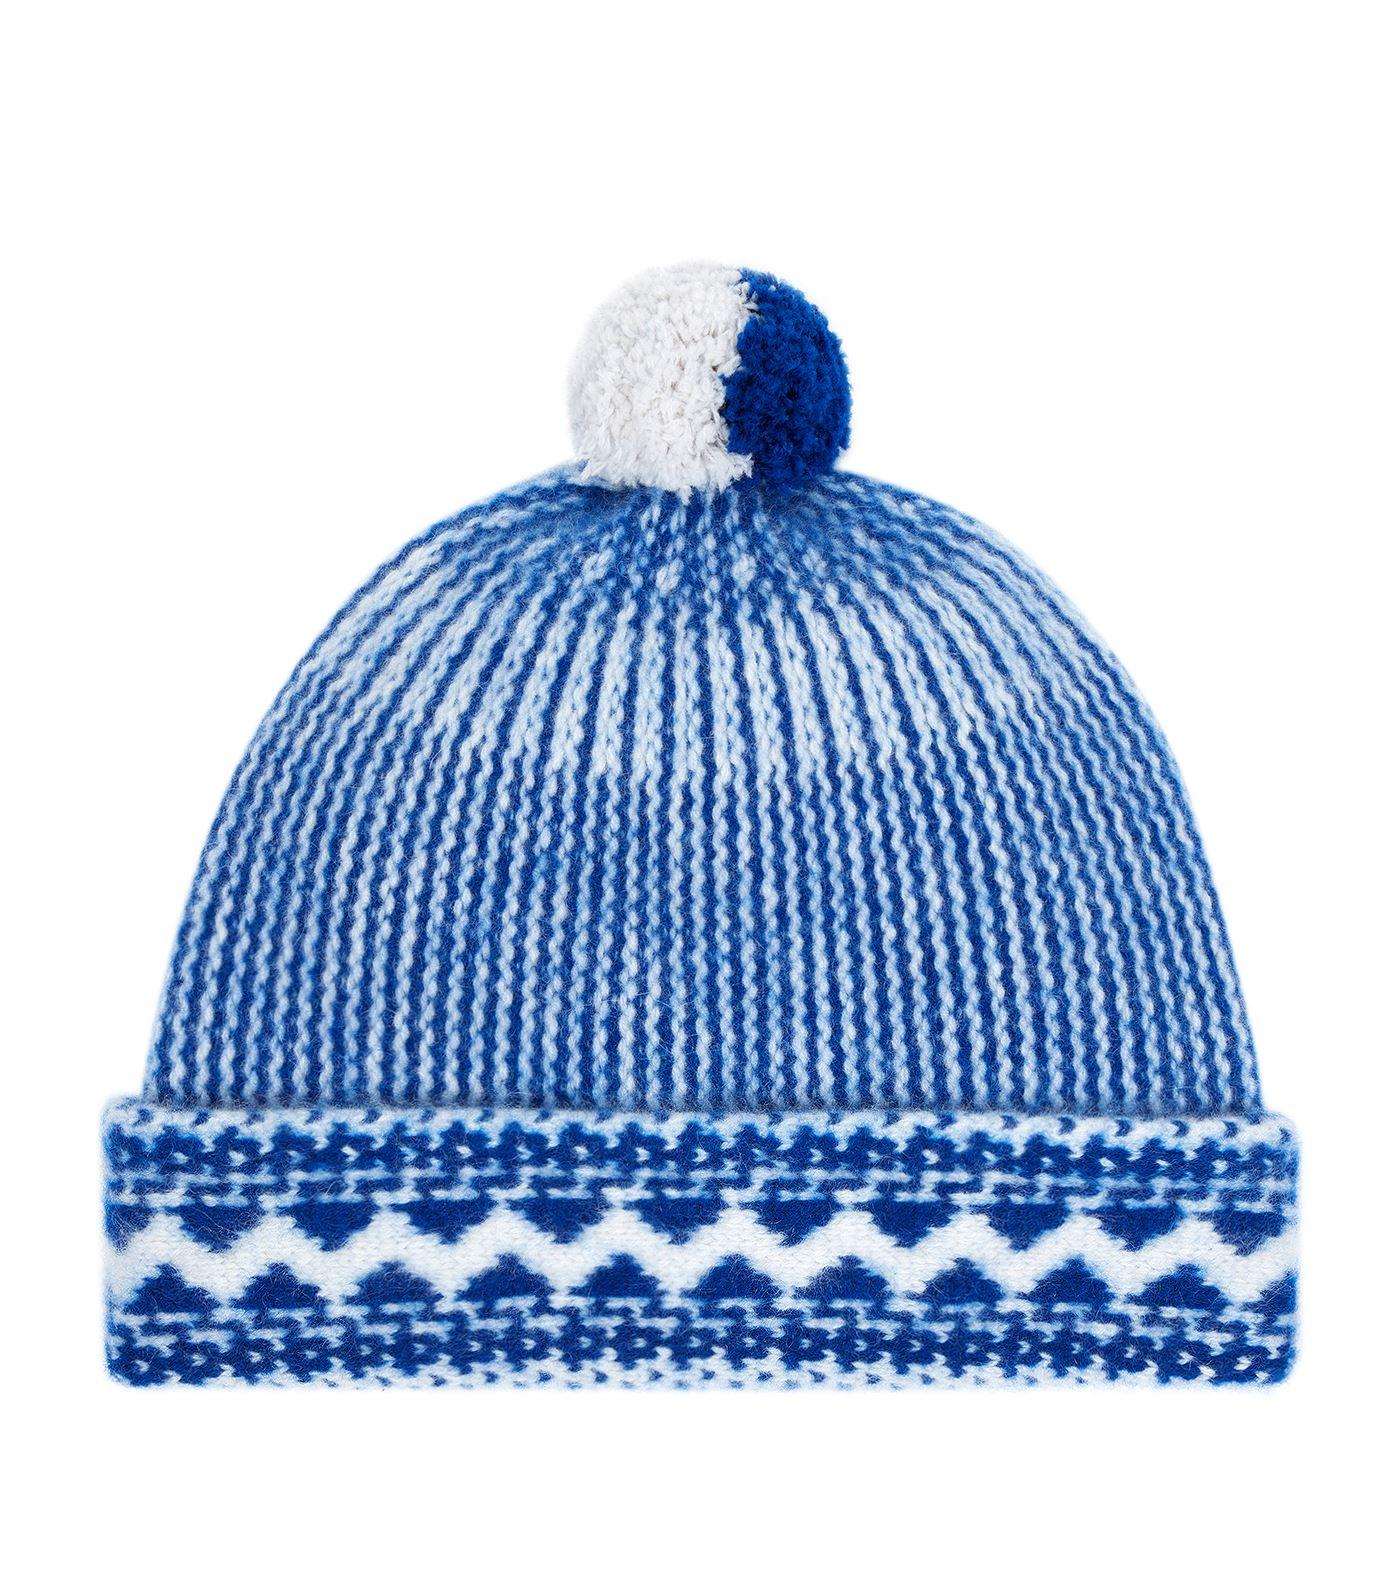 952a4cdd318 Burberry Fair Isle Pom-Pom Cashmere Beanie In Blue